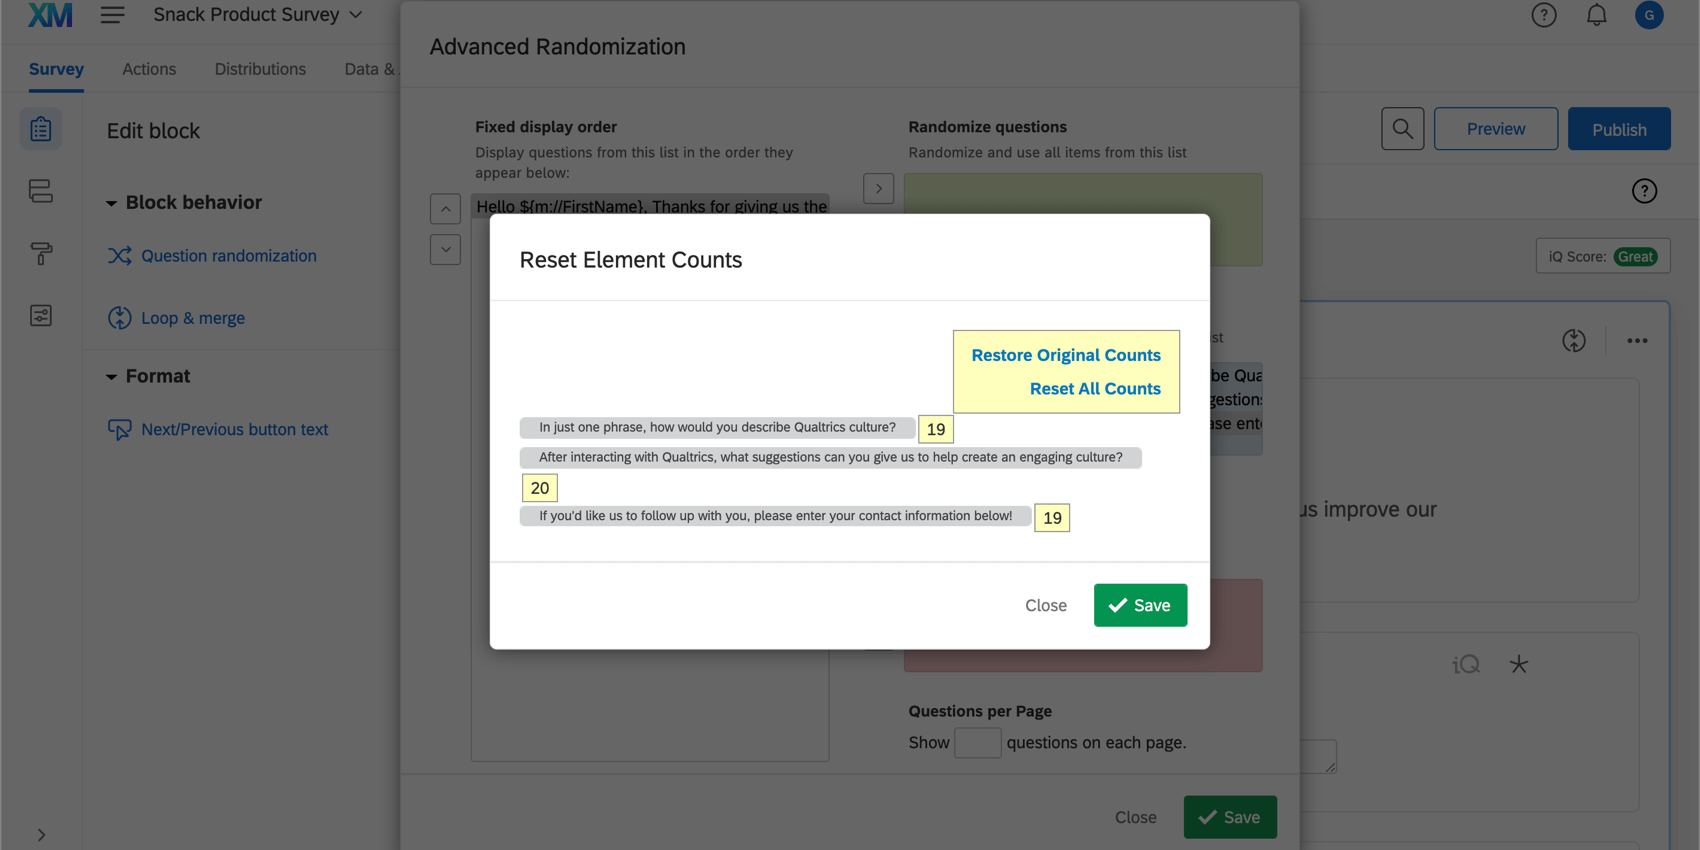 Reset element counts in the advanced randomization menu